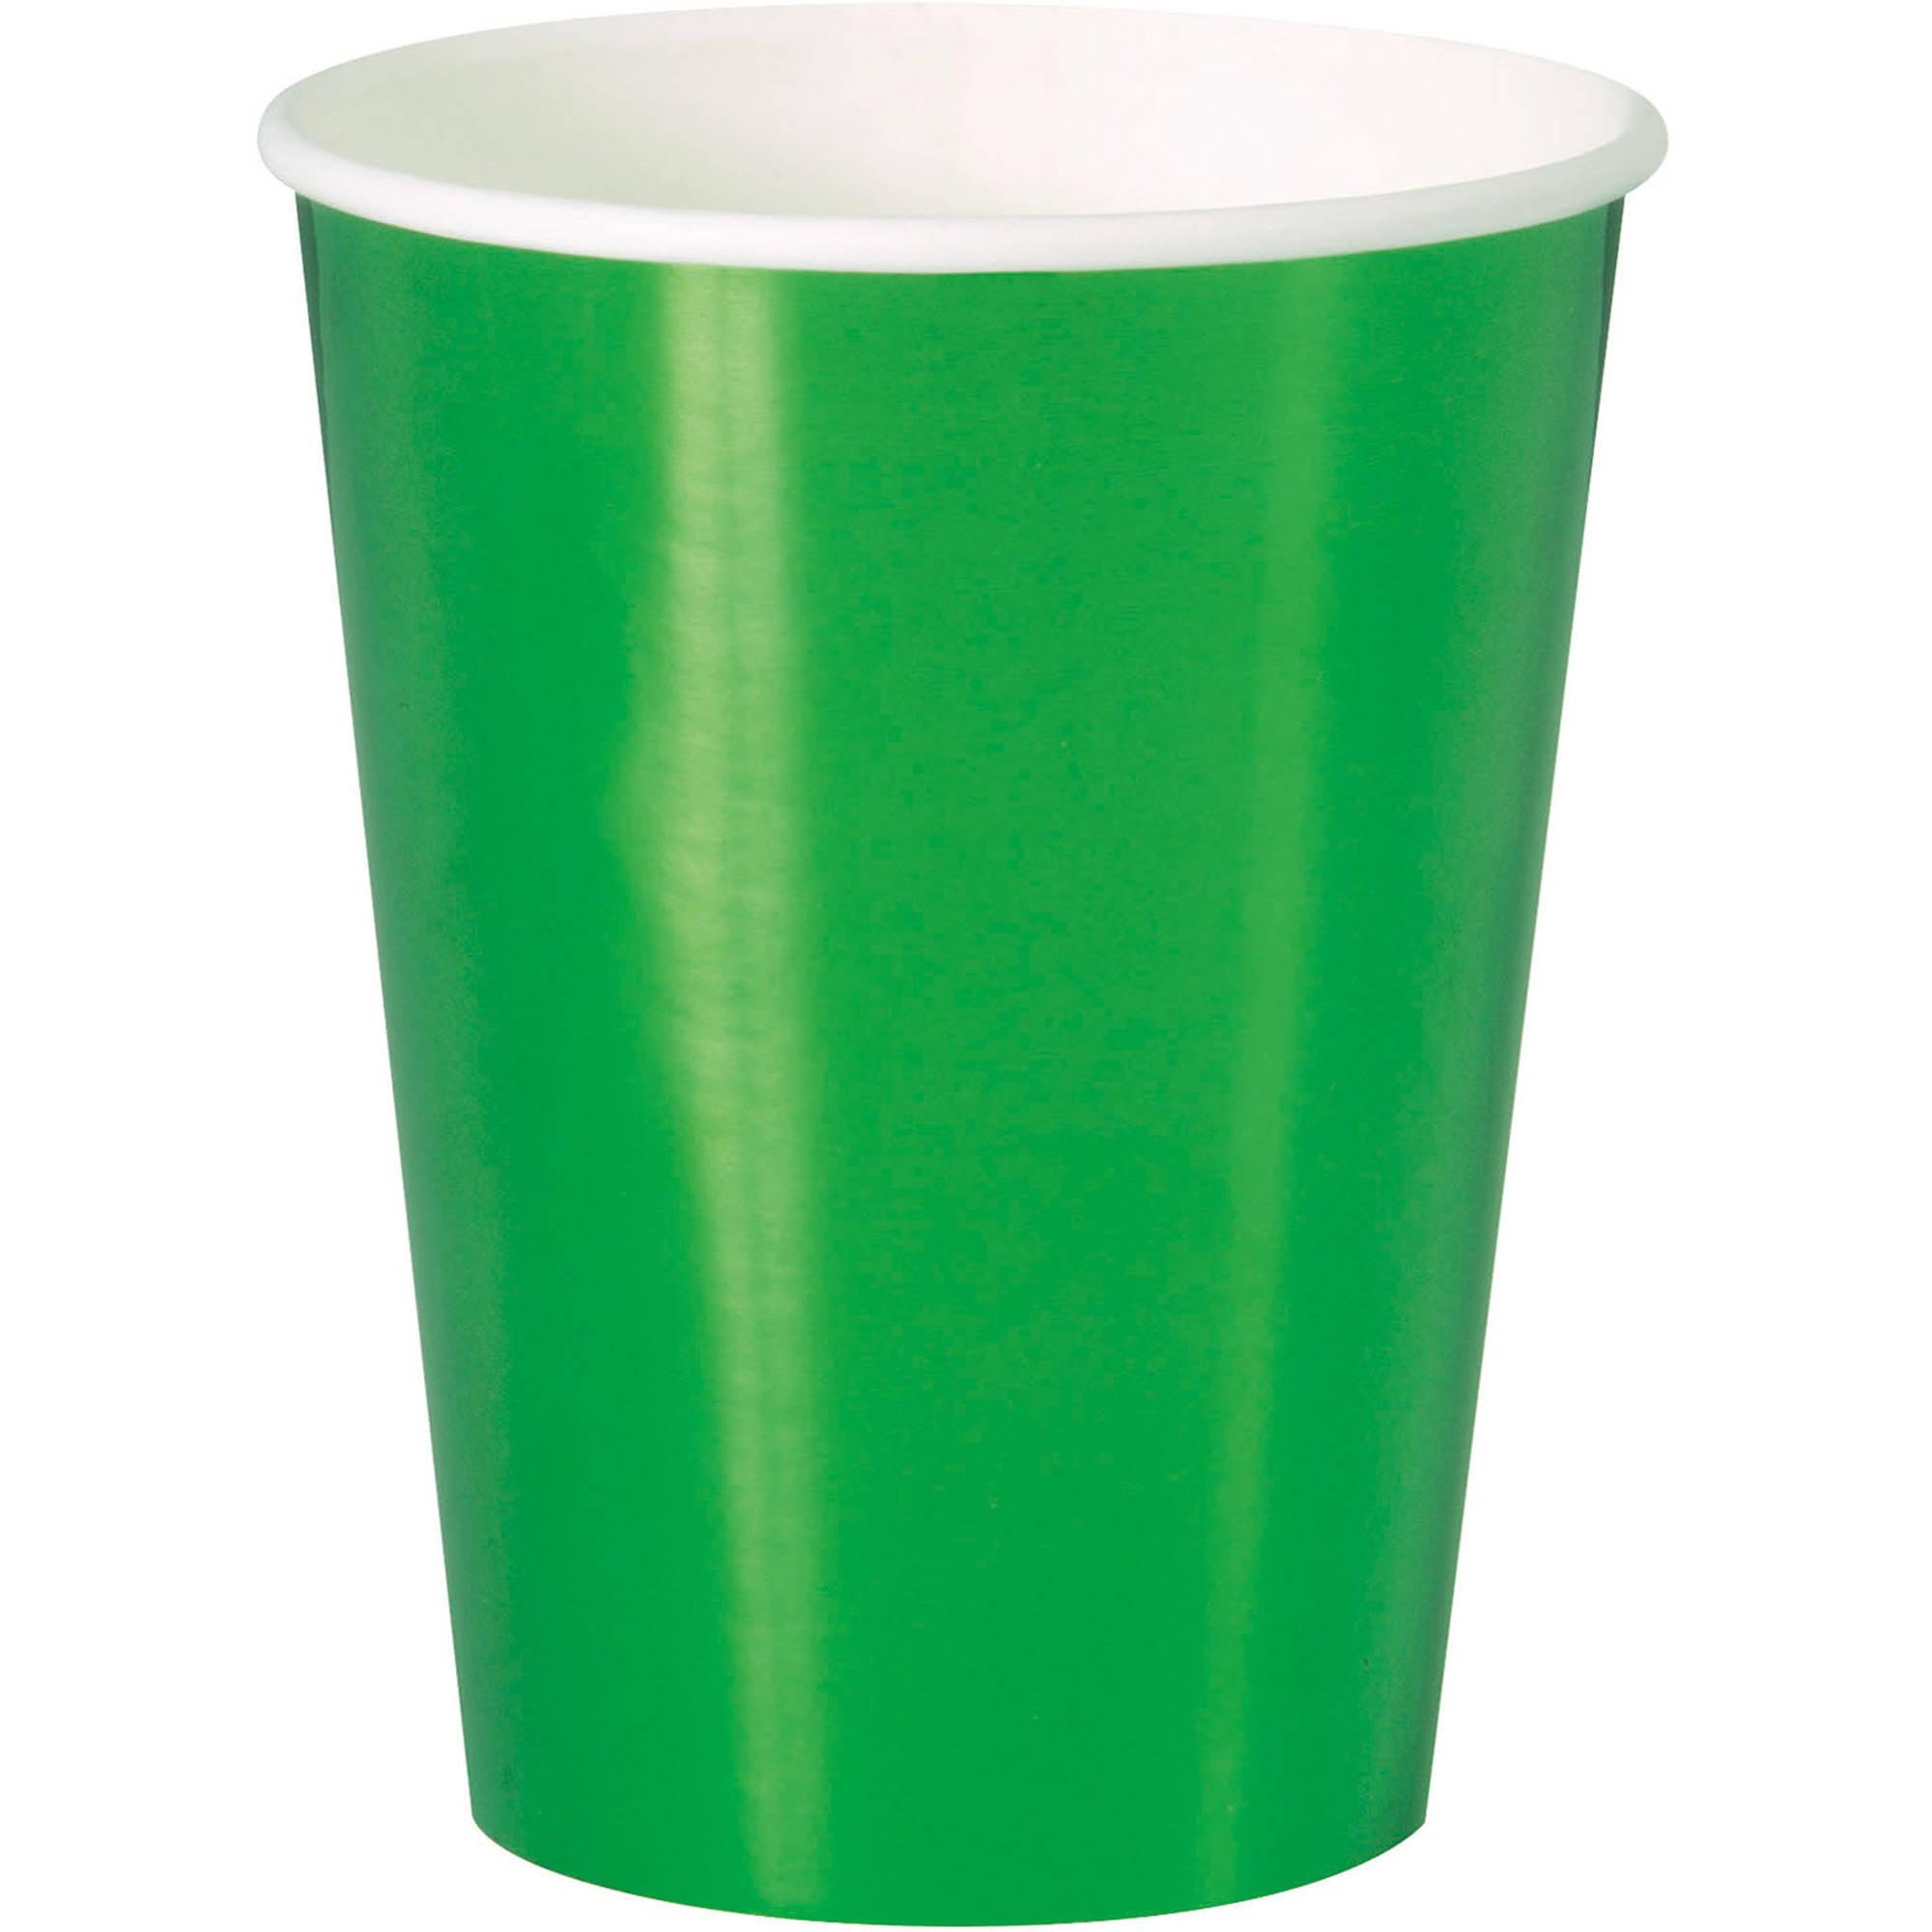 Paper Cups, 12 oz, Green Foil, 8ct